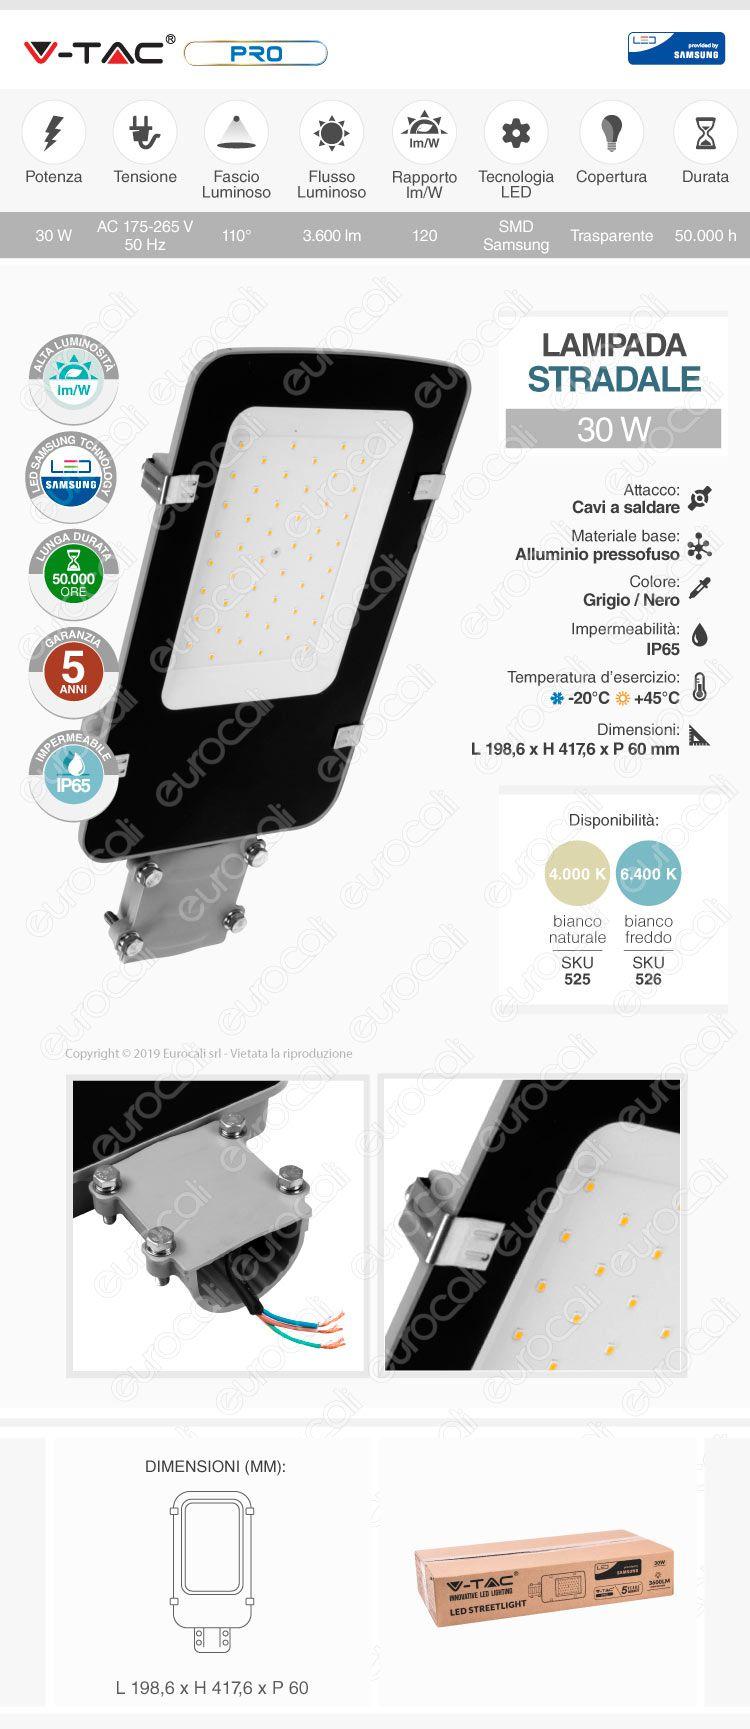 V-Tac PRO VT-30ST Lampada Stradale LED 30W Lampione SMD Chip Samsung